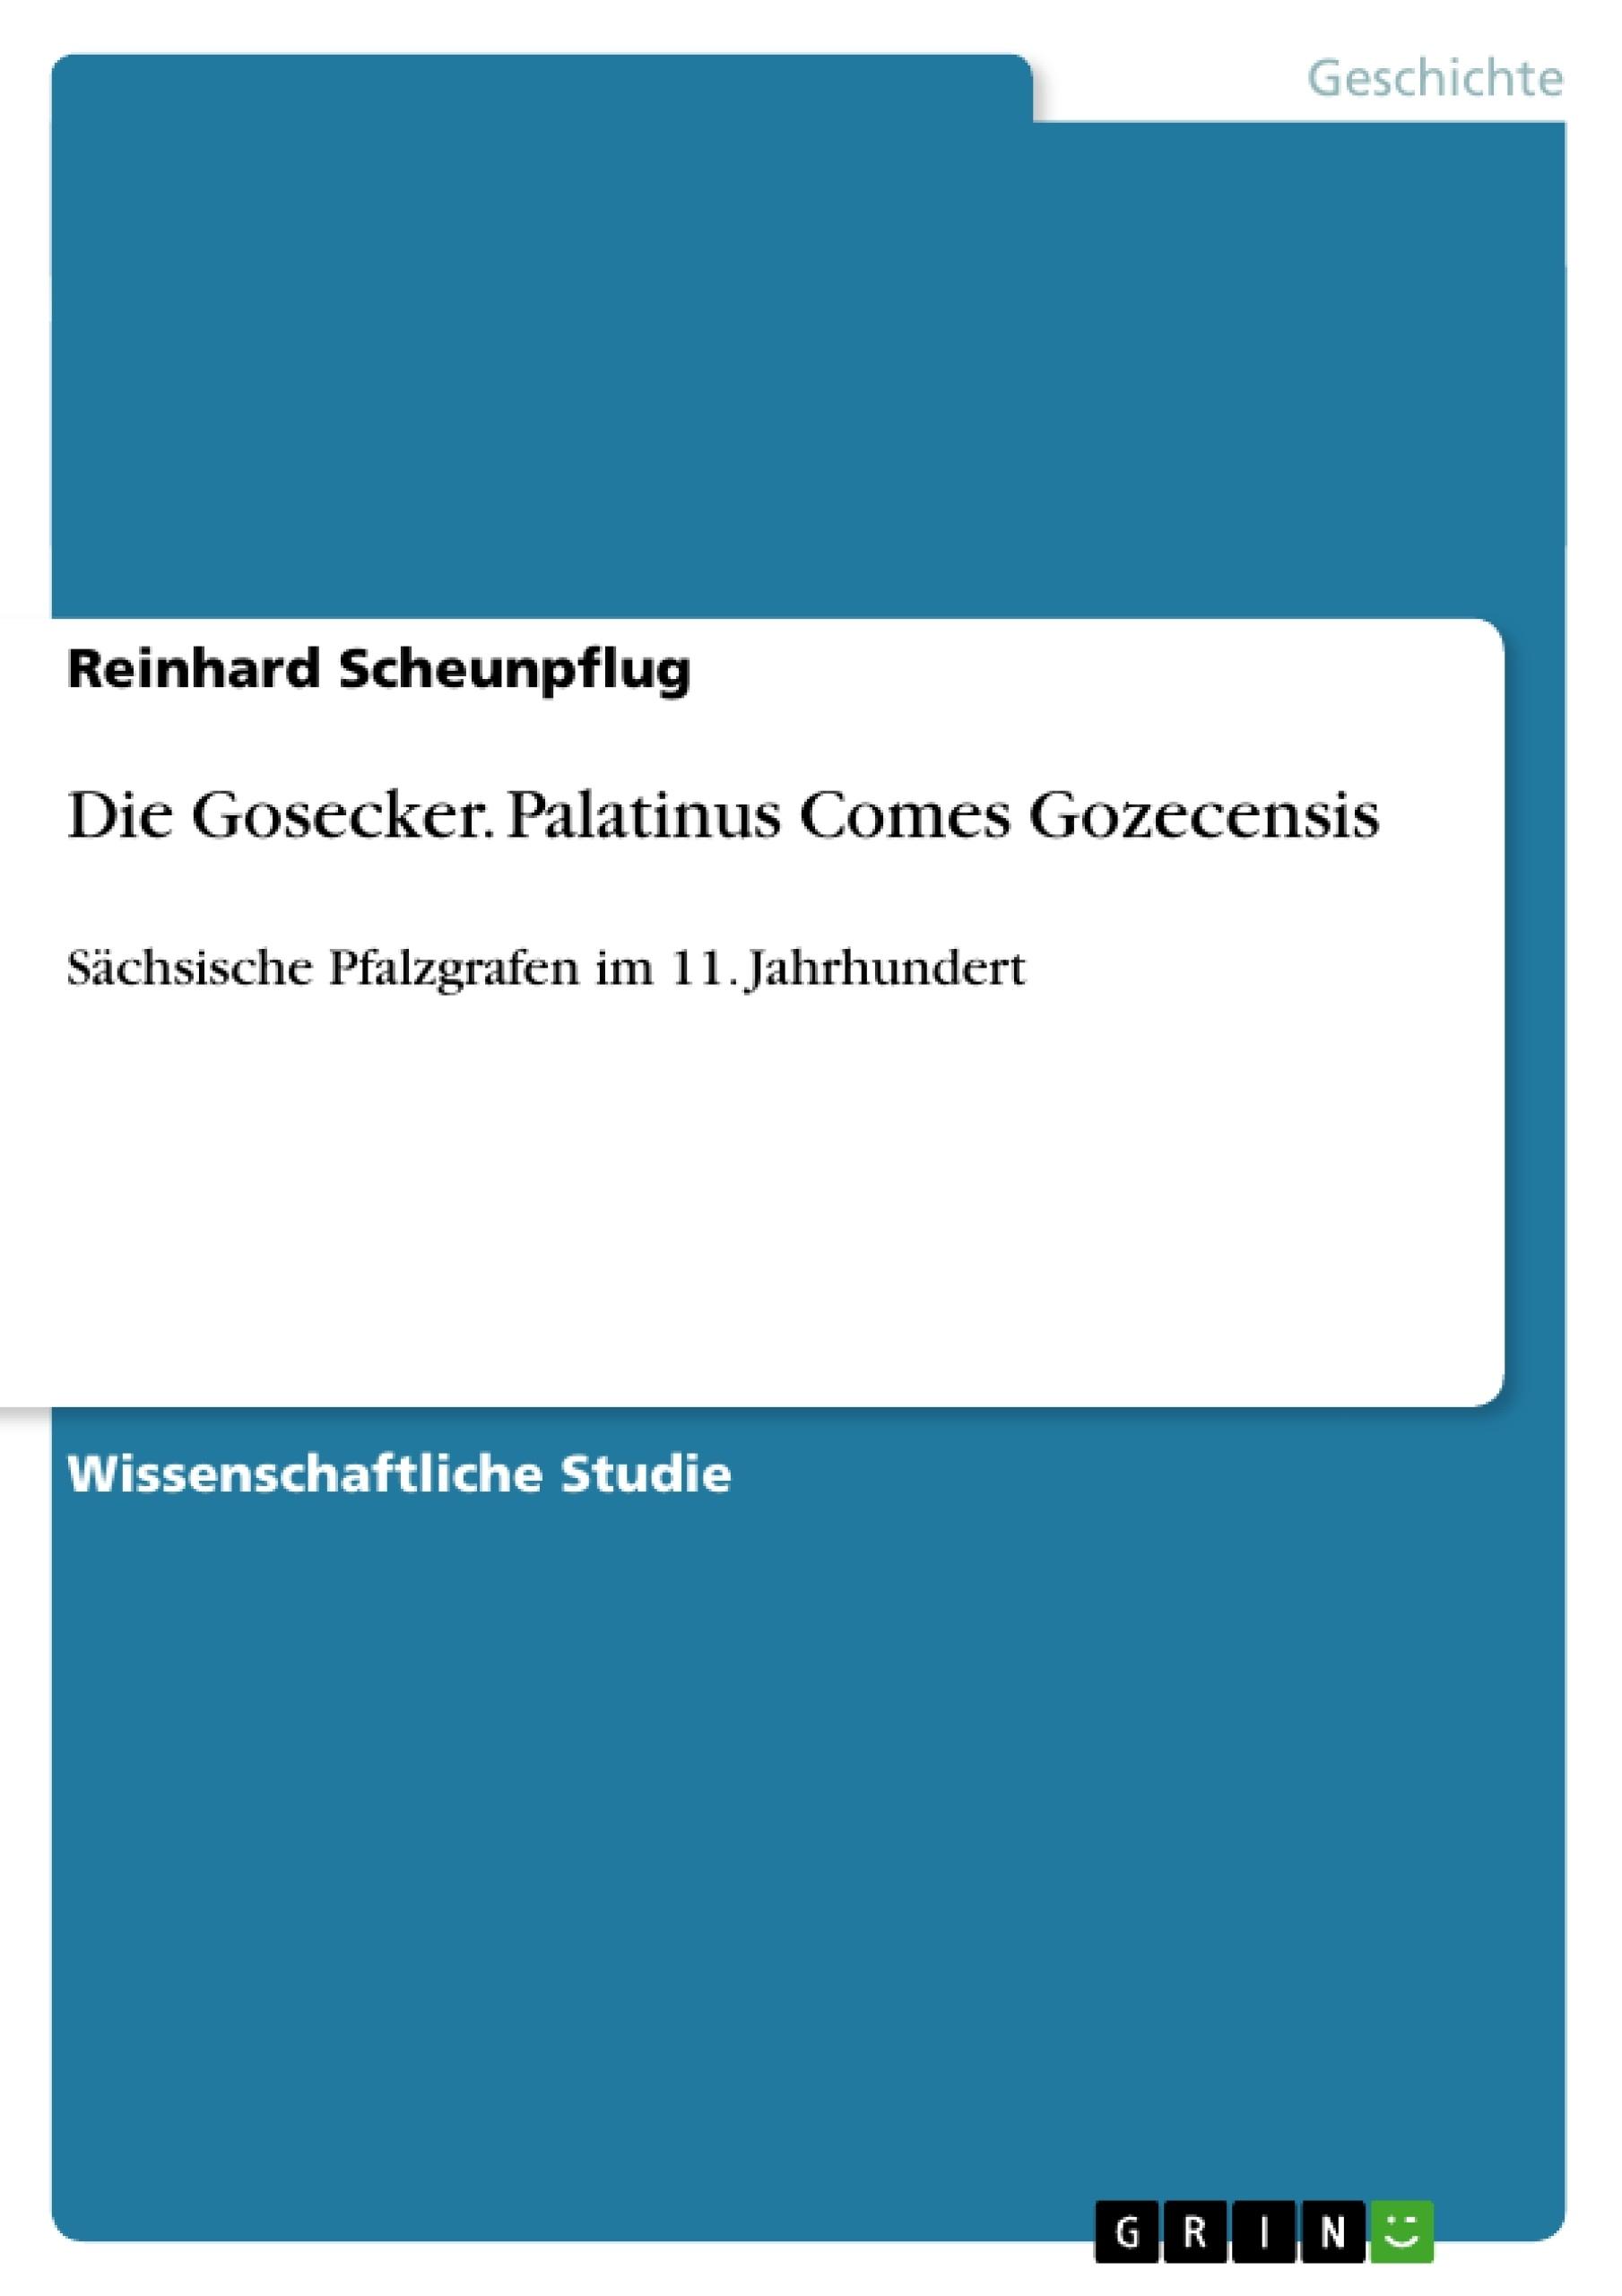 Titel: Die Gosecker. Palatinus Comes Gozecensis